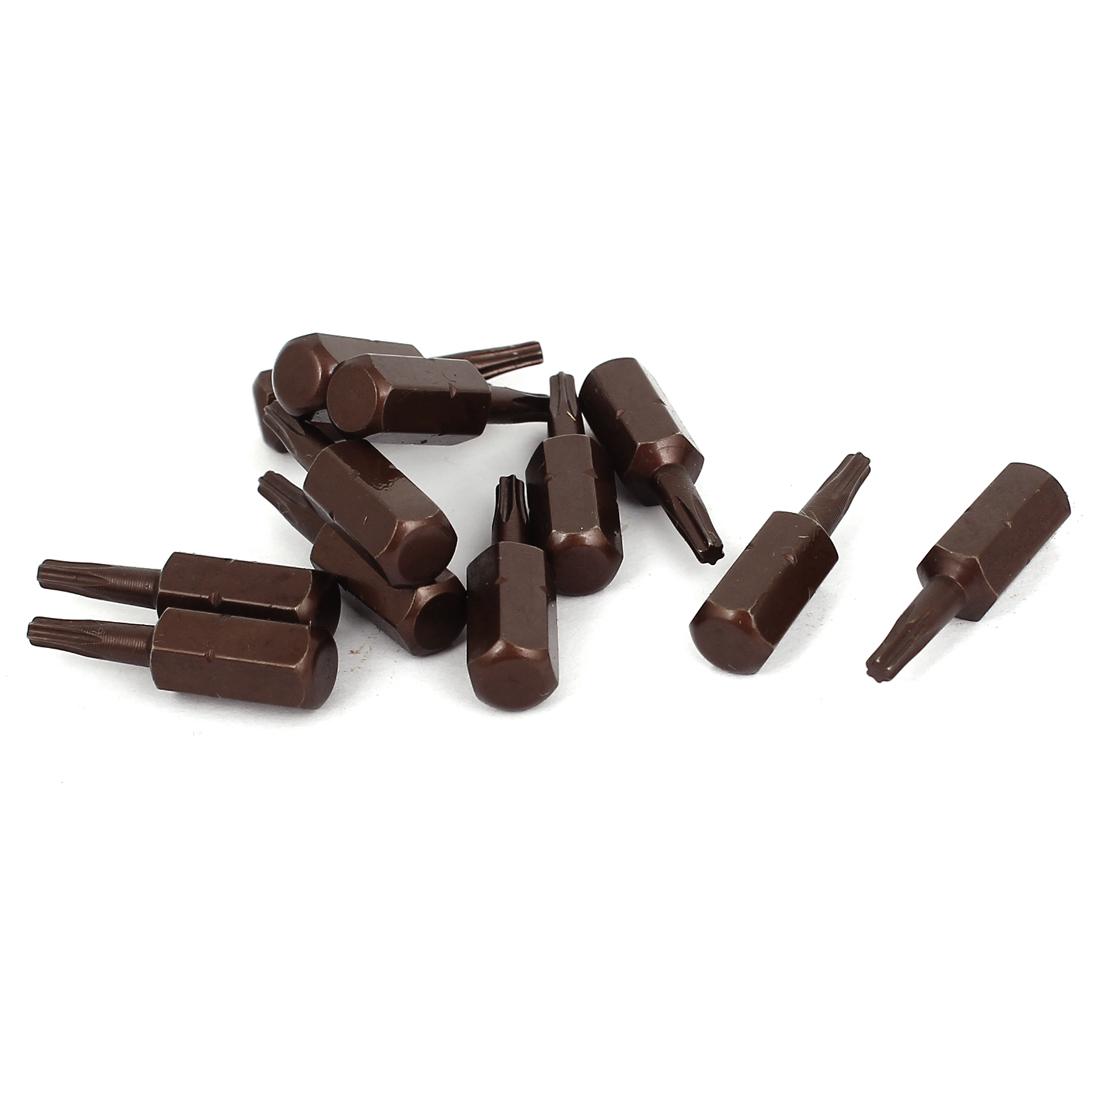 "25mm Length 1/4"" Hex Shank T9 Magnetic Tip Torx Screwdriver Bits 12 Pcs"